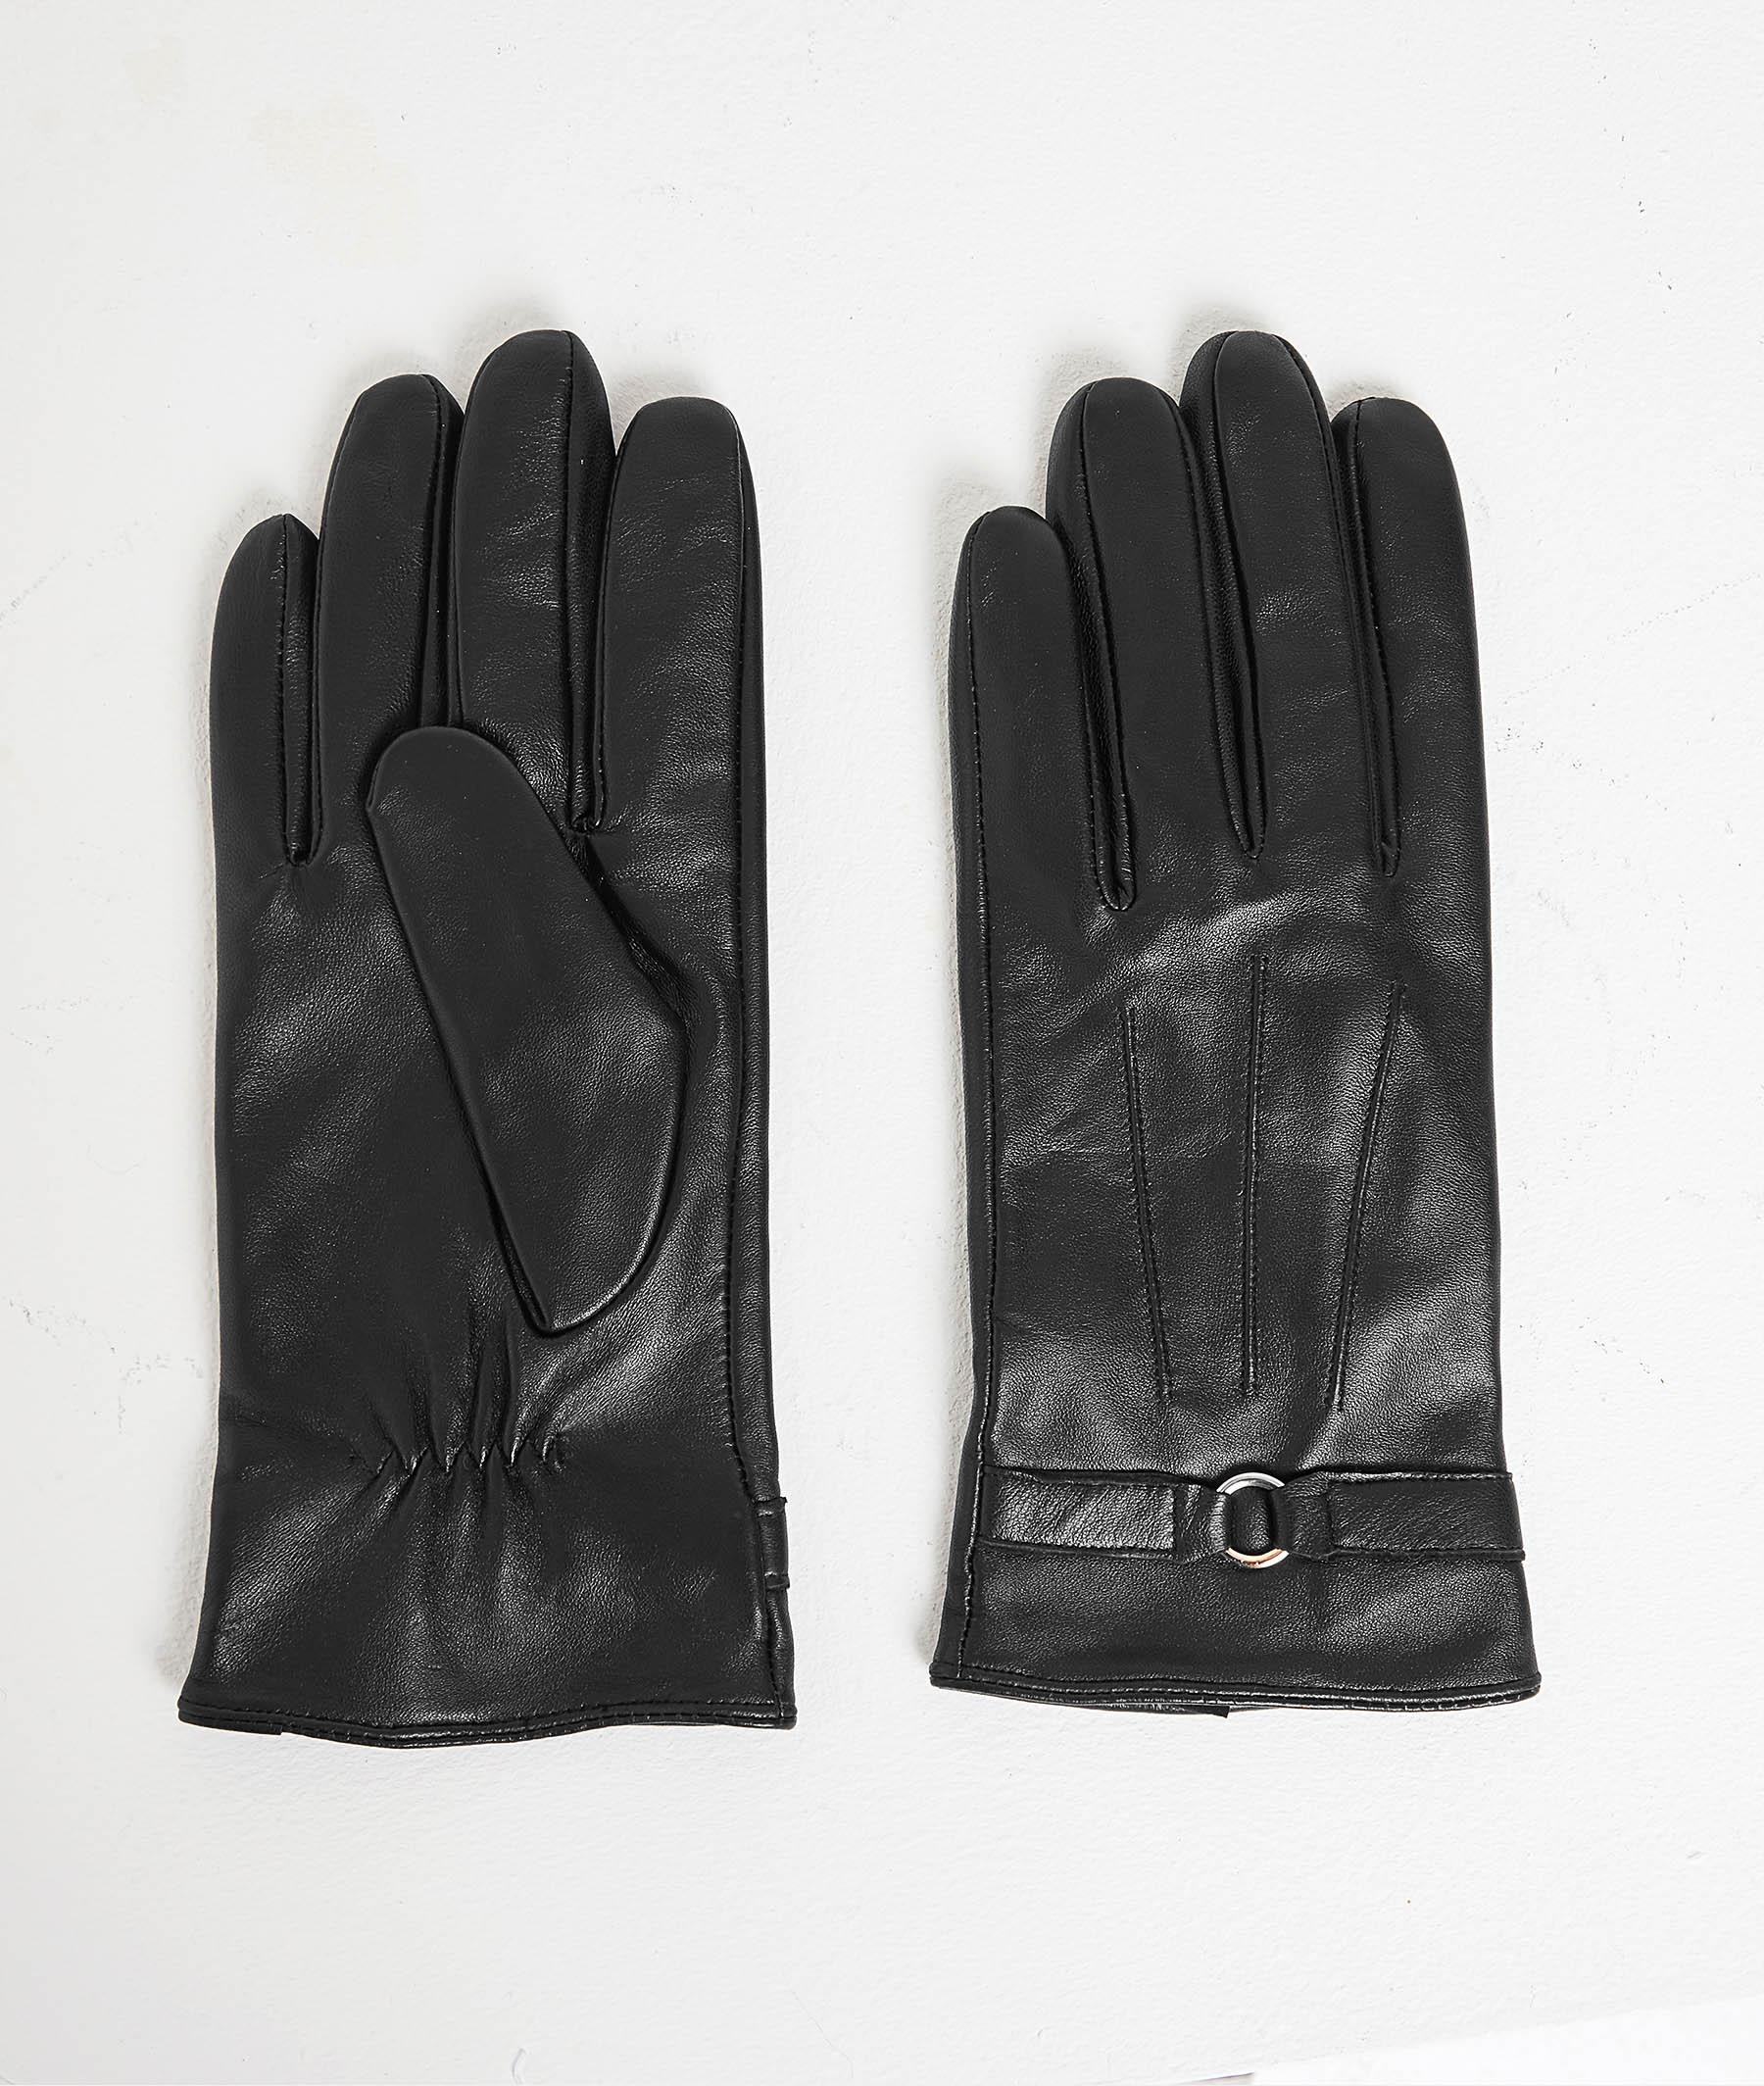 Gants en cuir noir femme NOIR